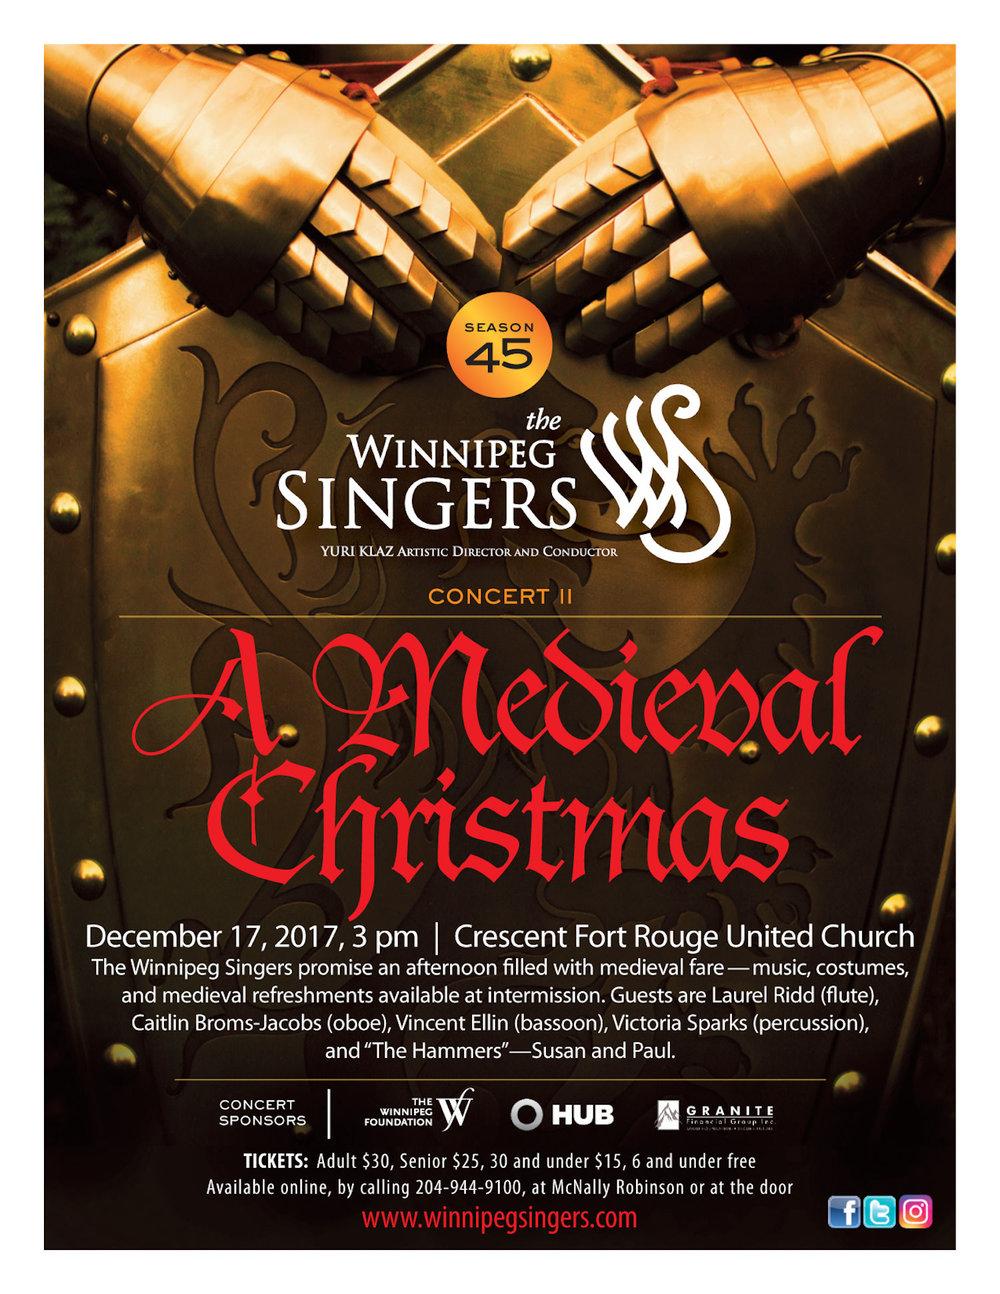 concert-2-2017-winnipeg-singers-poster.jpg